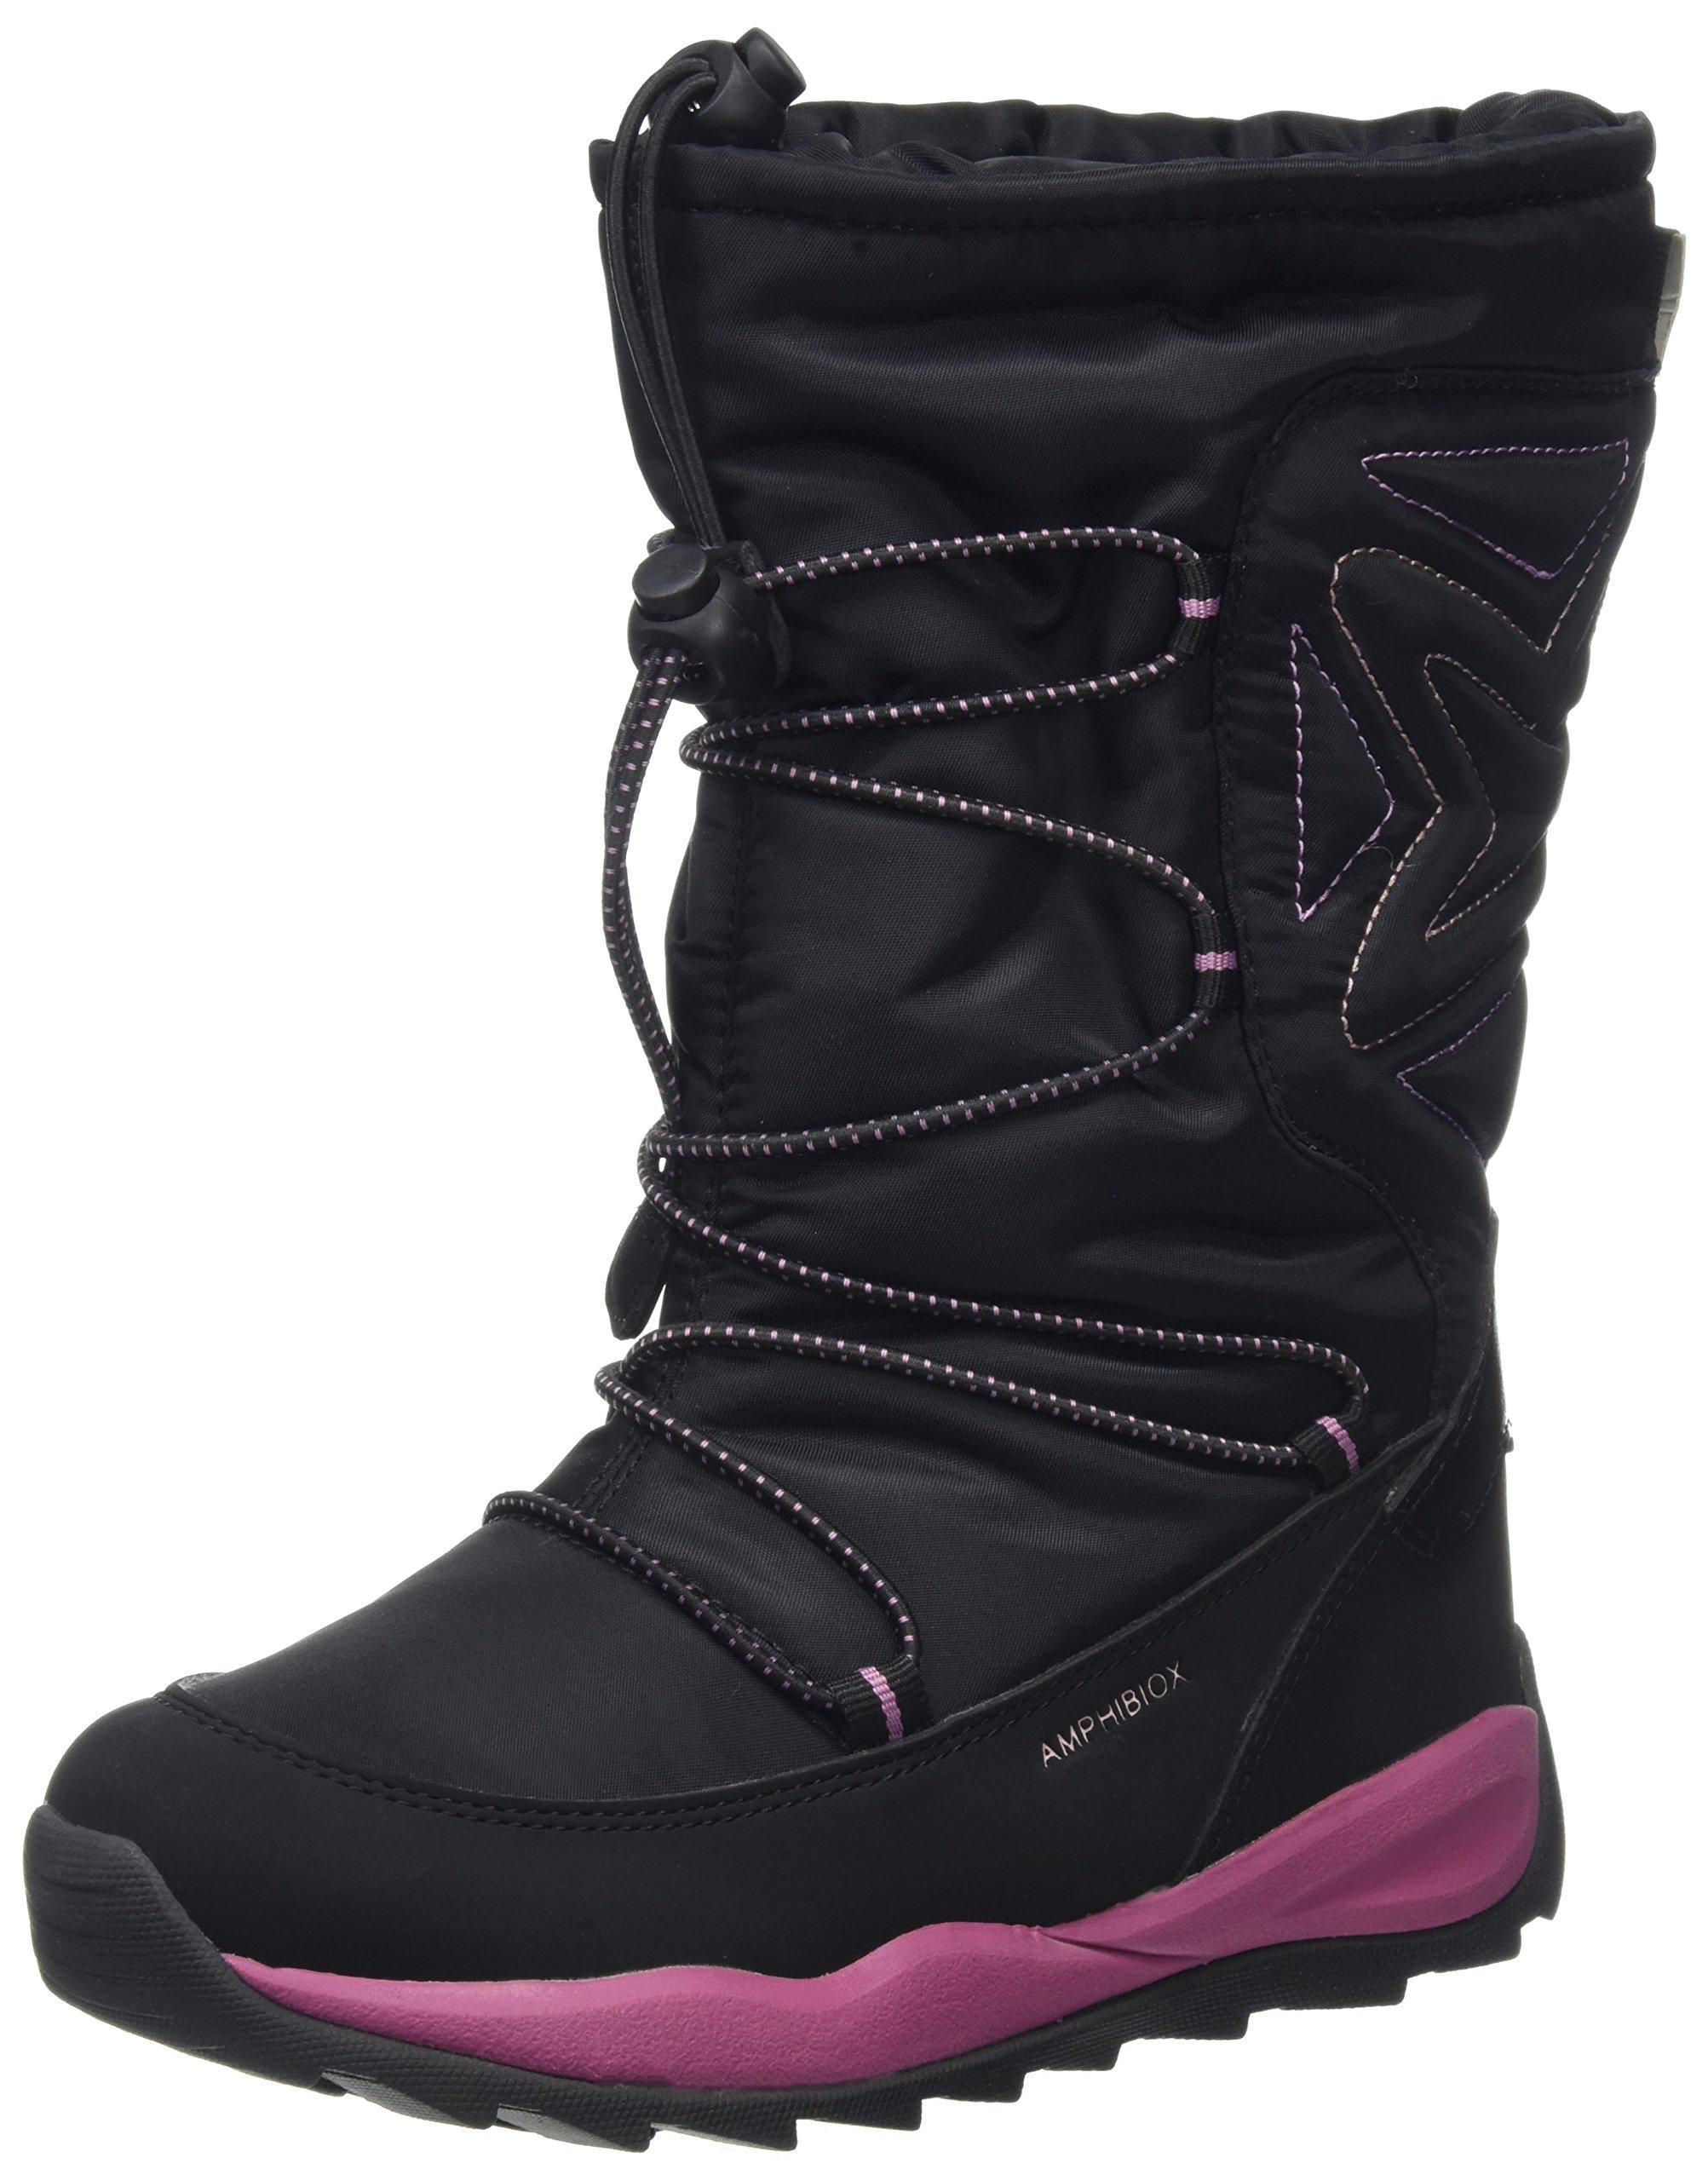 Geox J Orizont B Girl ABX, Botas de Nieve Niñas